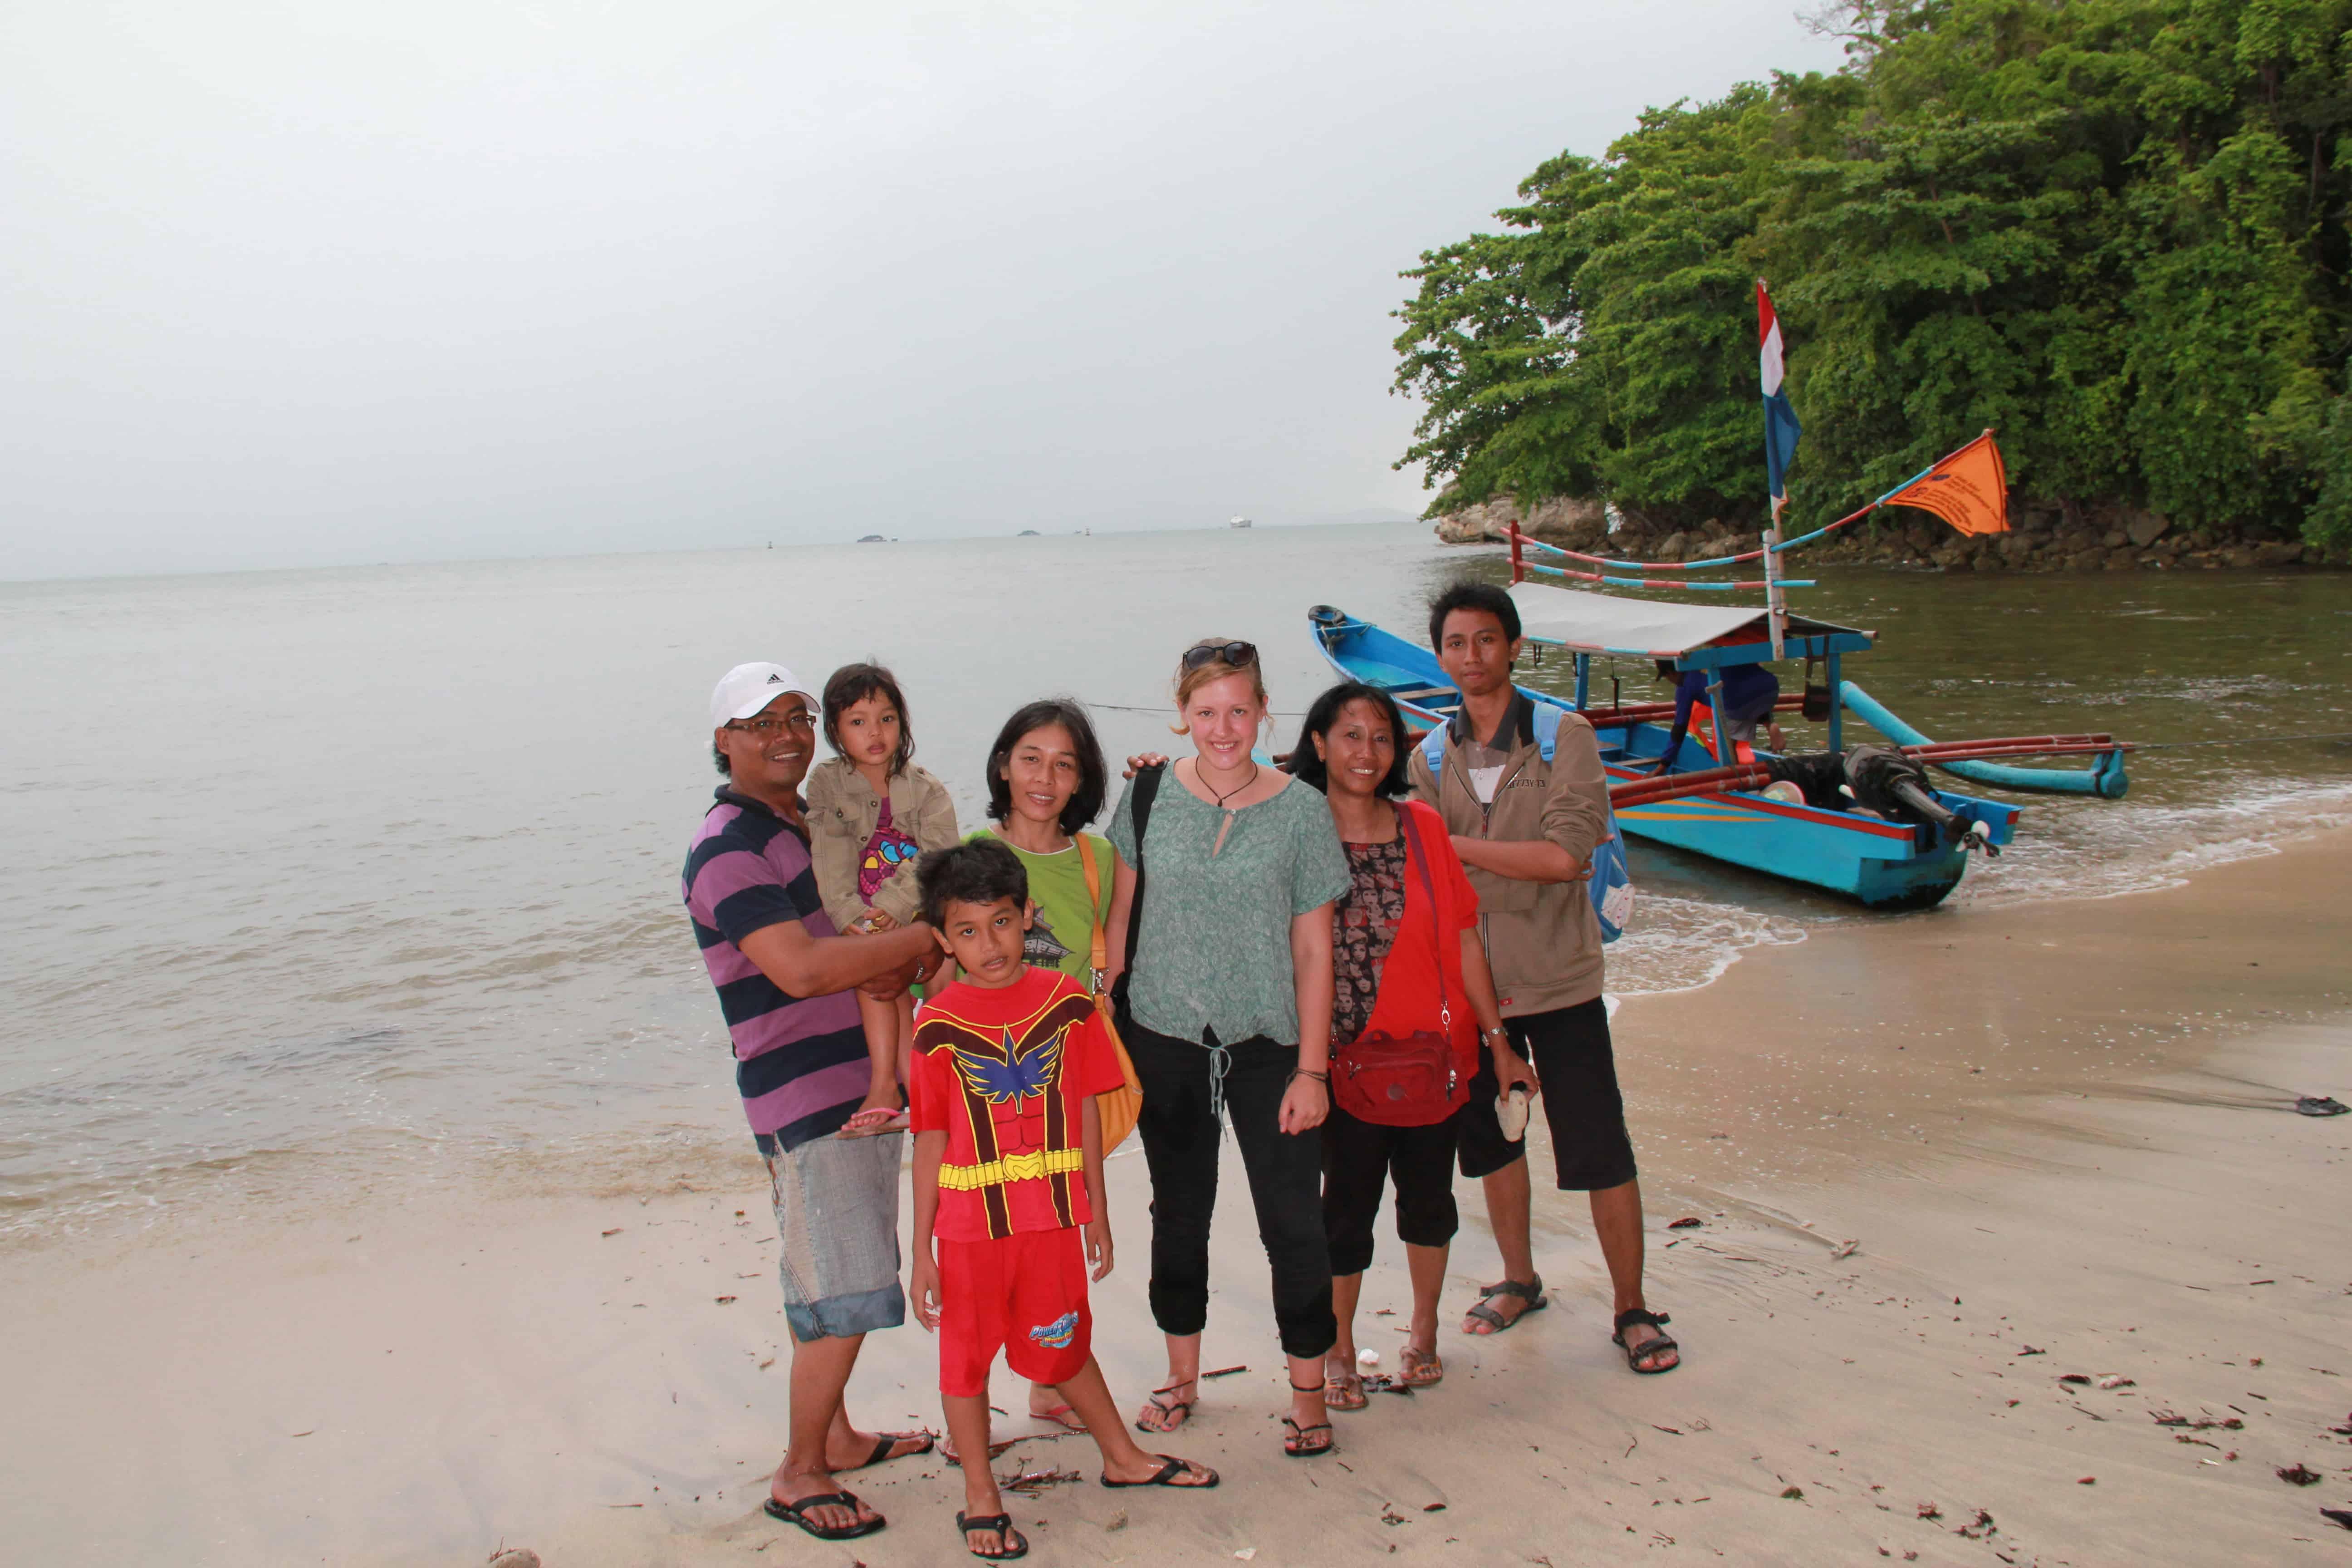 Romana Lührmann, Indonesien, Strand